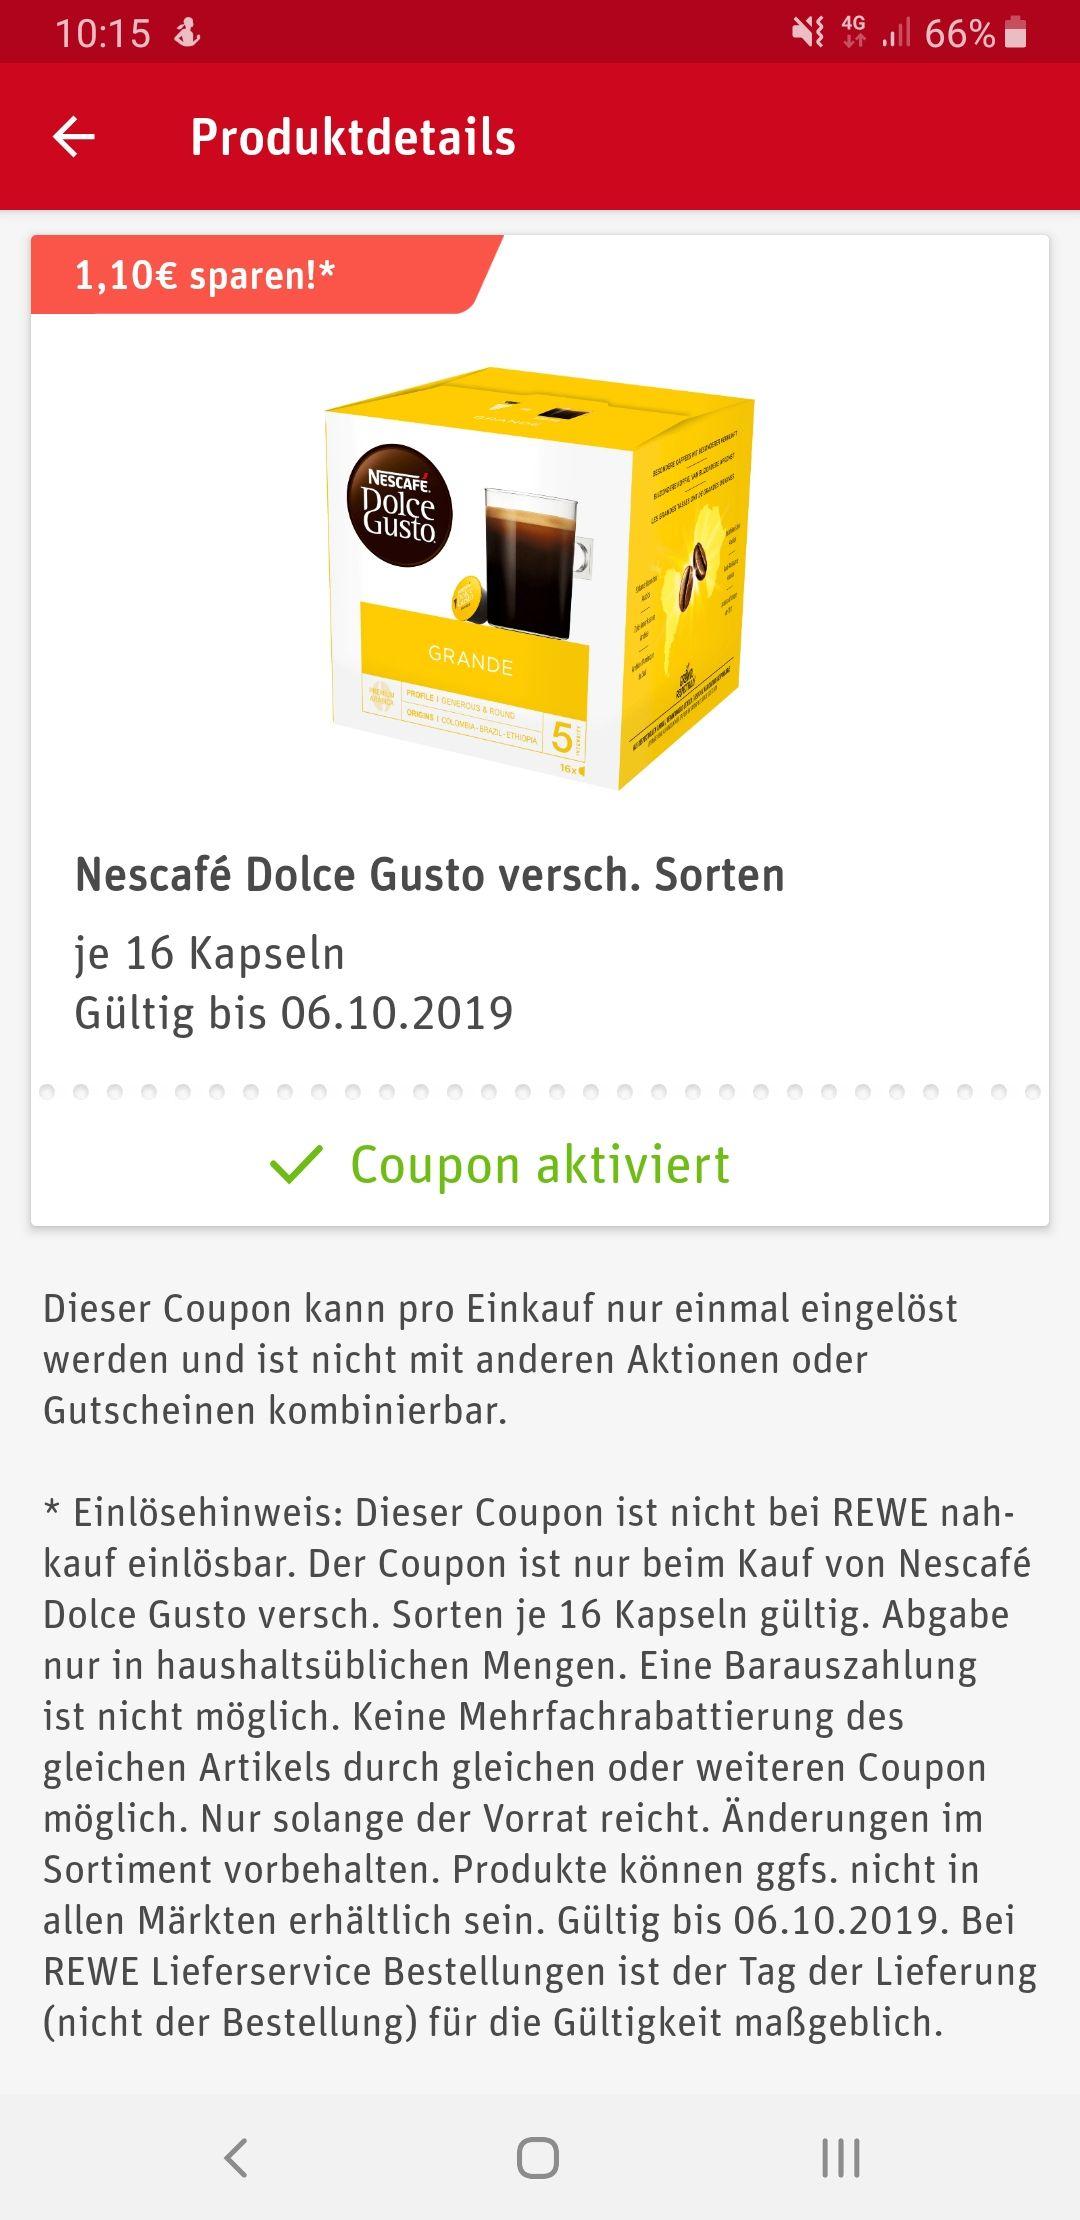 Nescafé Dolce Gusto Rewe App Rabatt-Coupon (-1.10€)